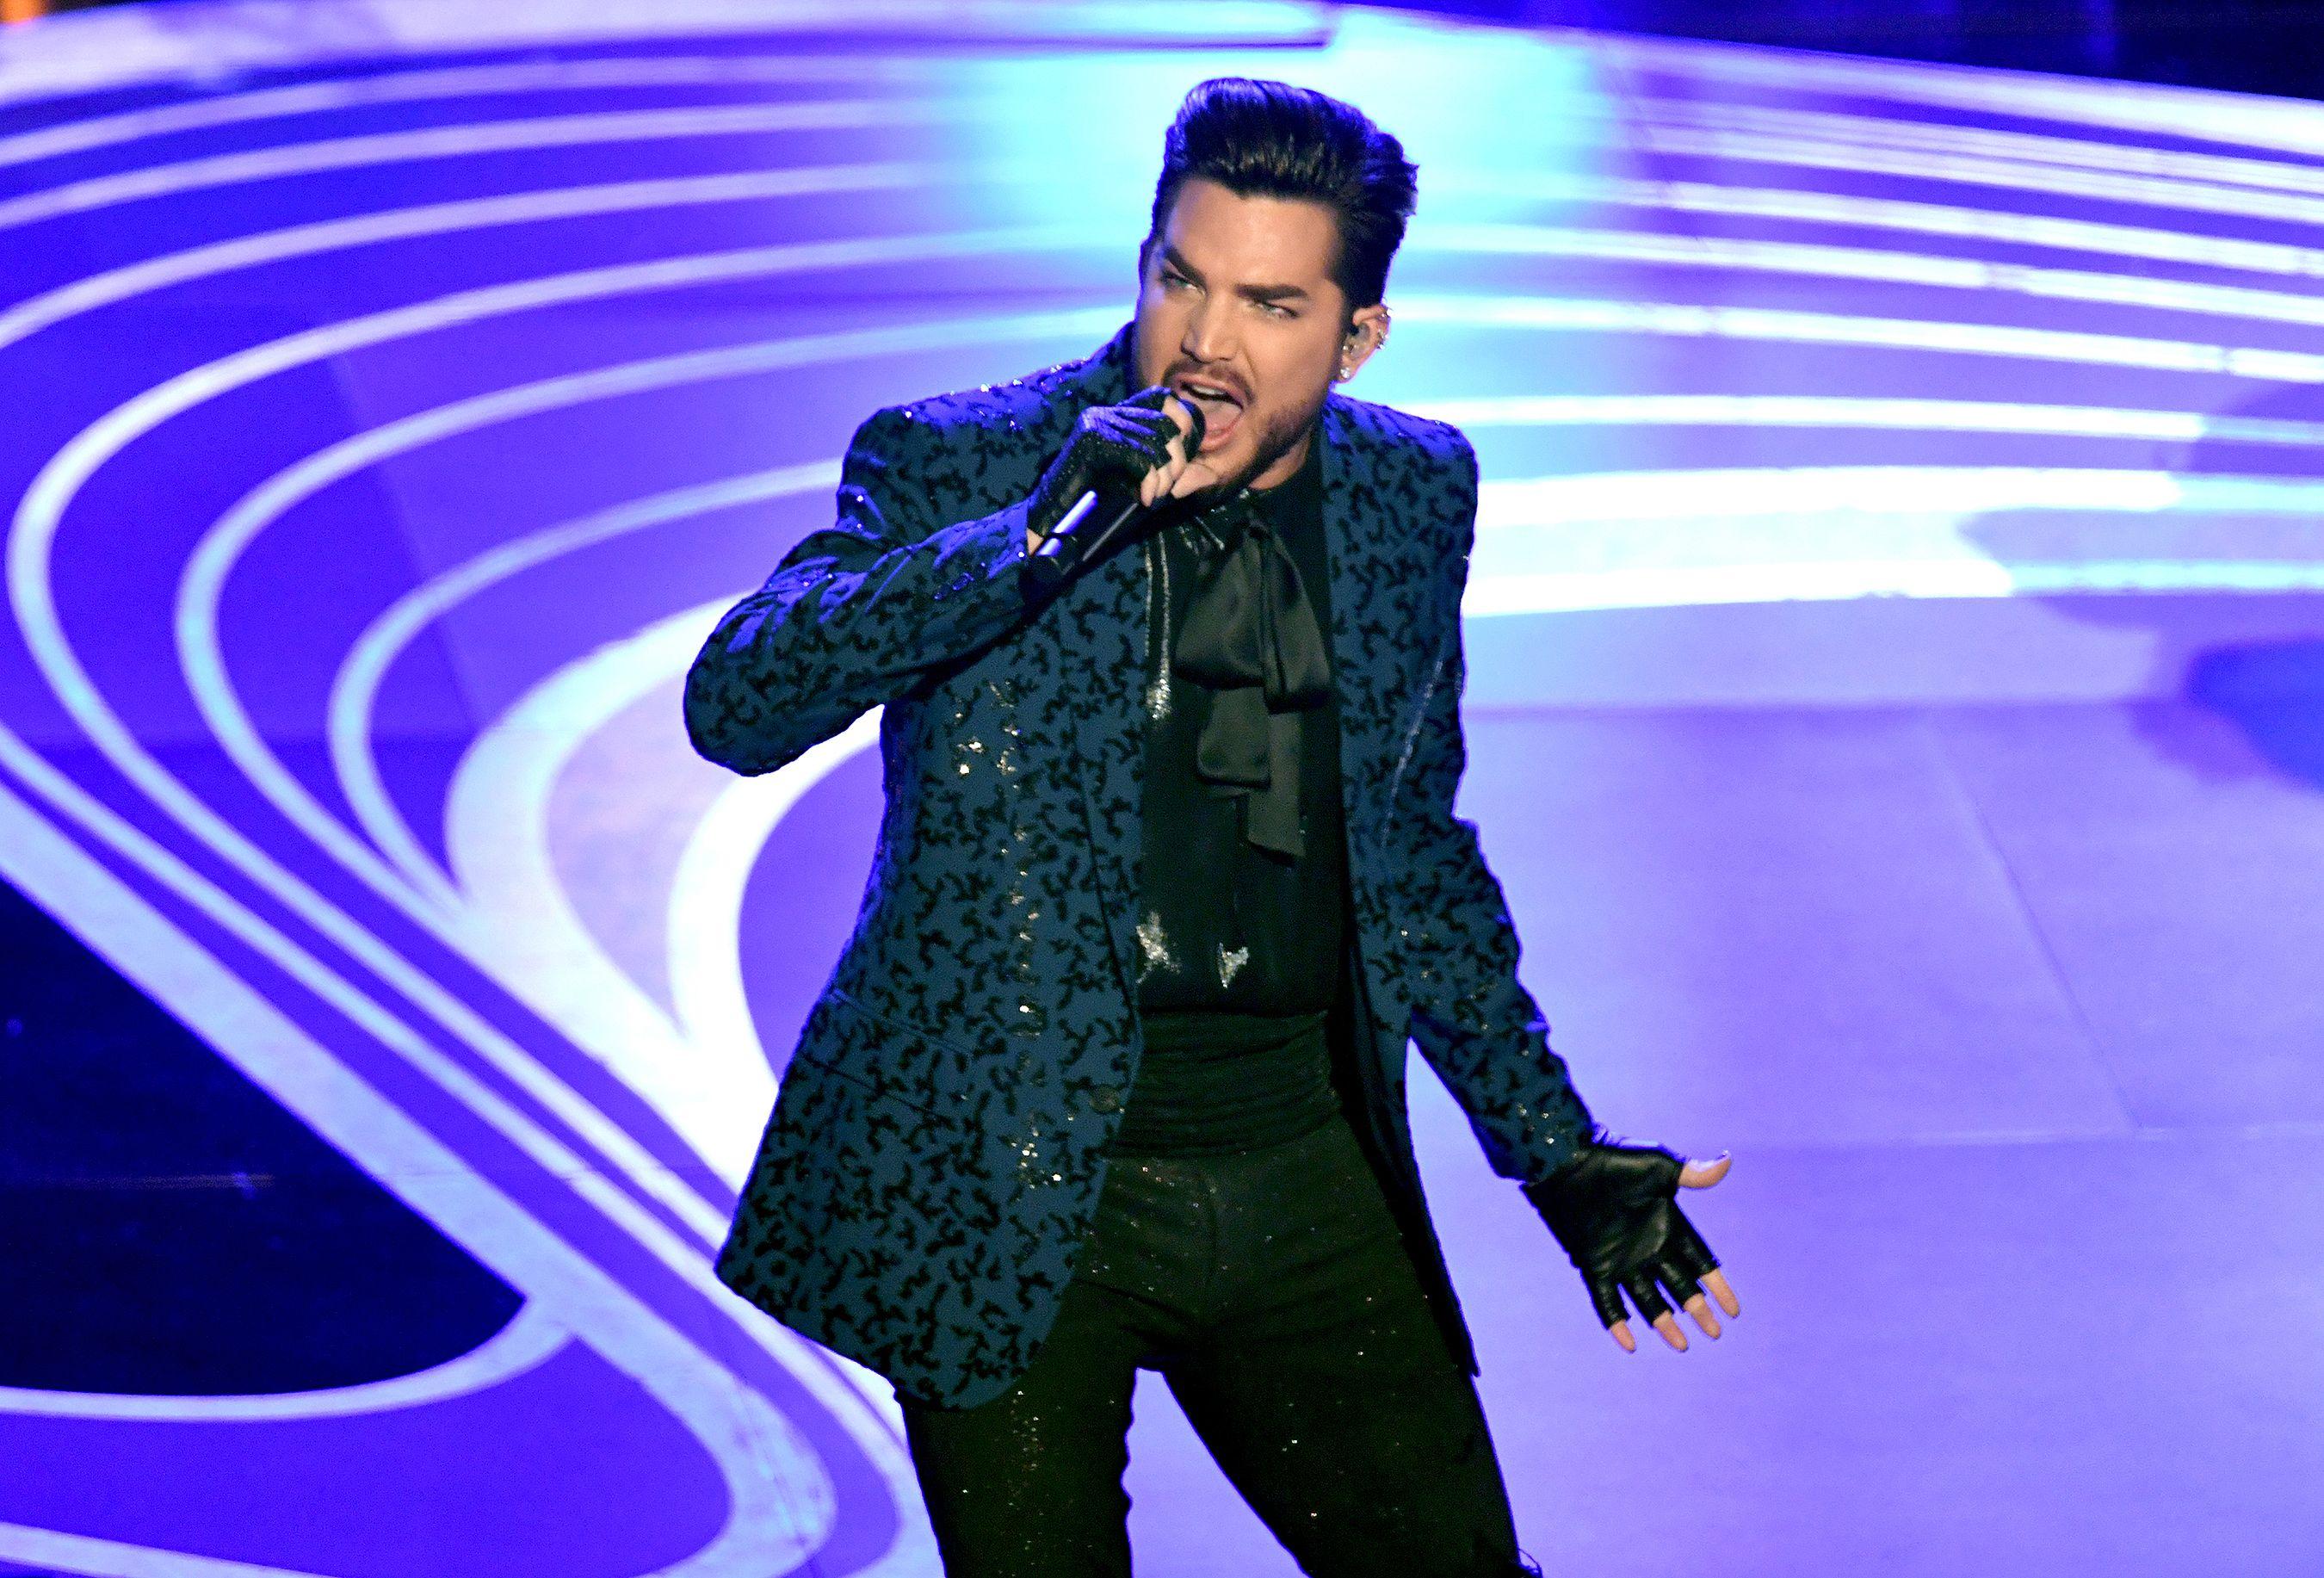 Queen And Adam Lambert Rock Out To A Standing Ovation At The 2019 Oscars Adam Lambert Hollywood California Concert